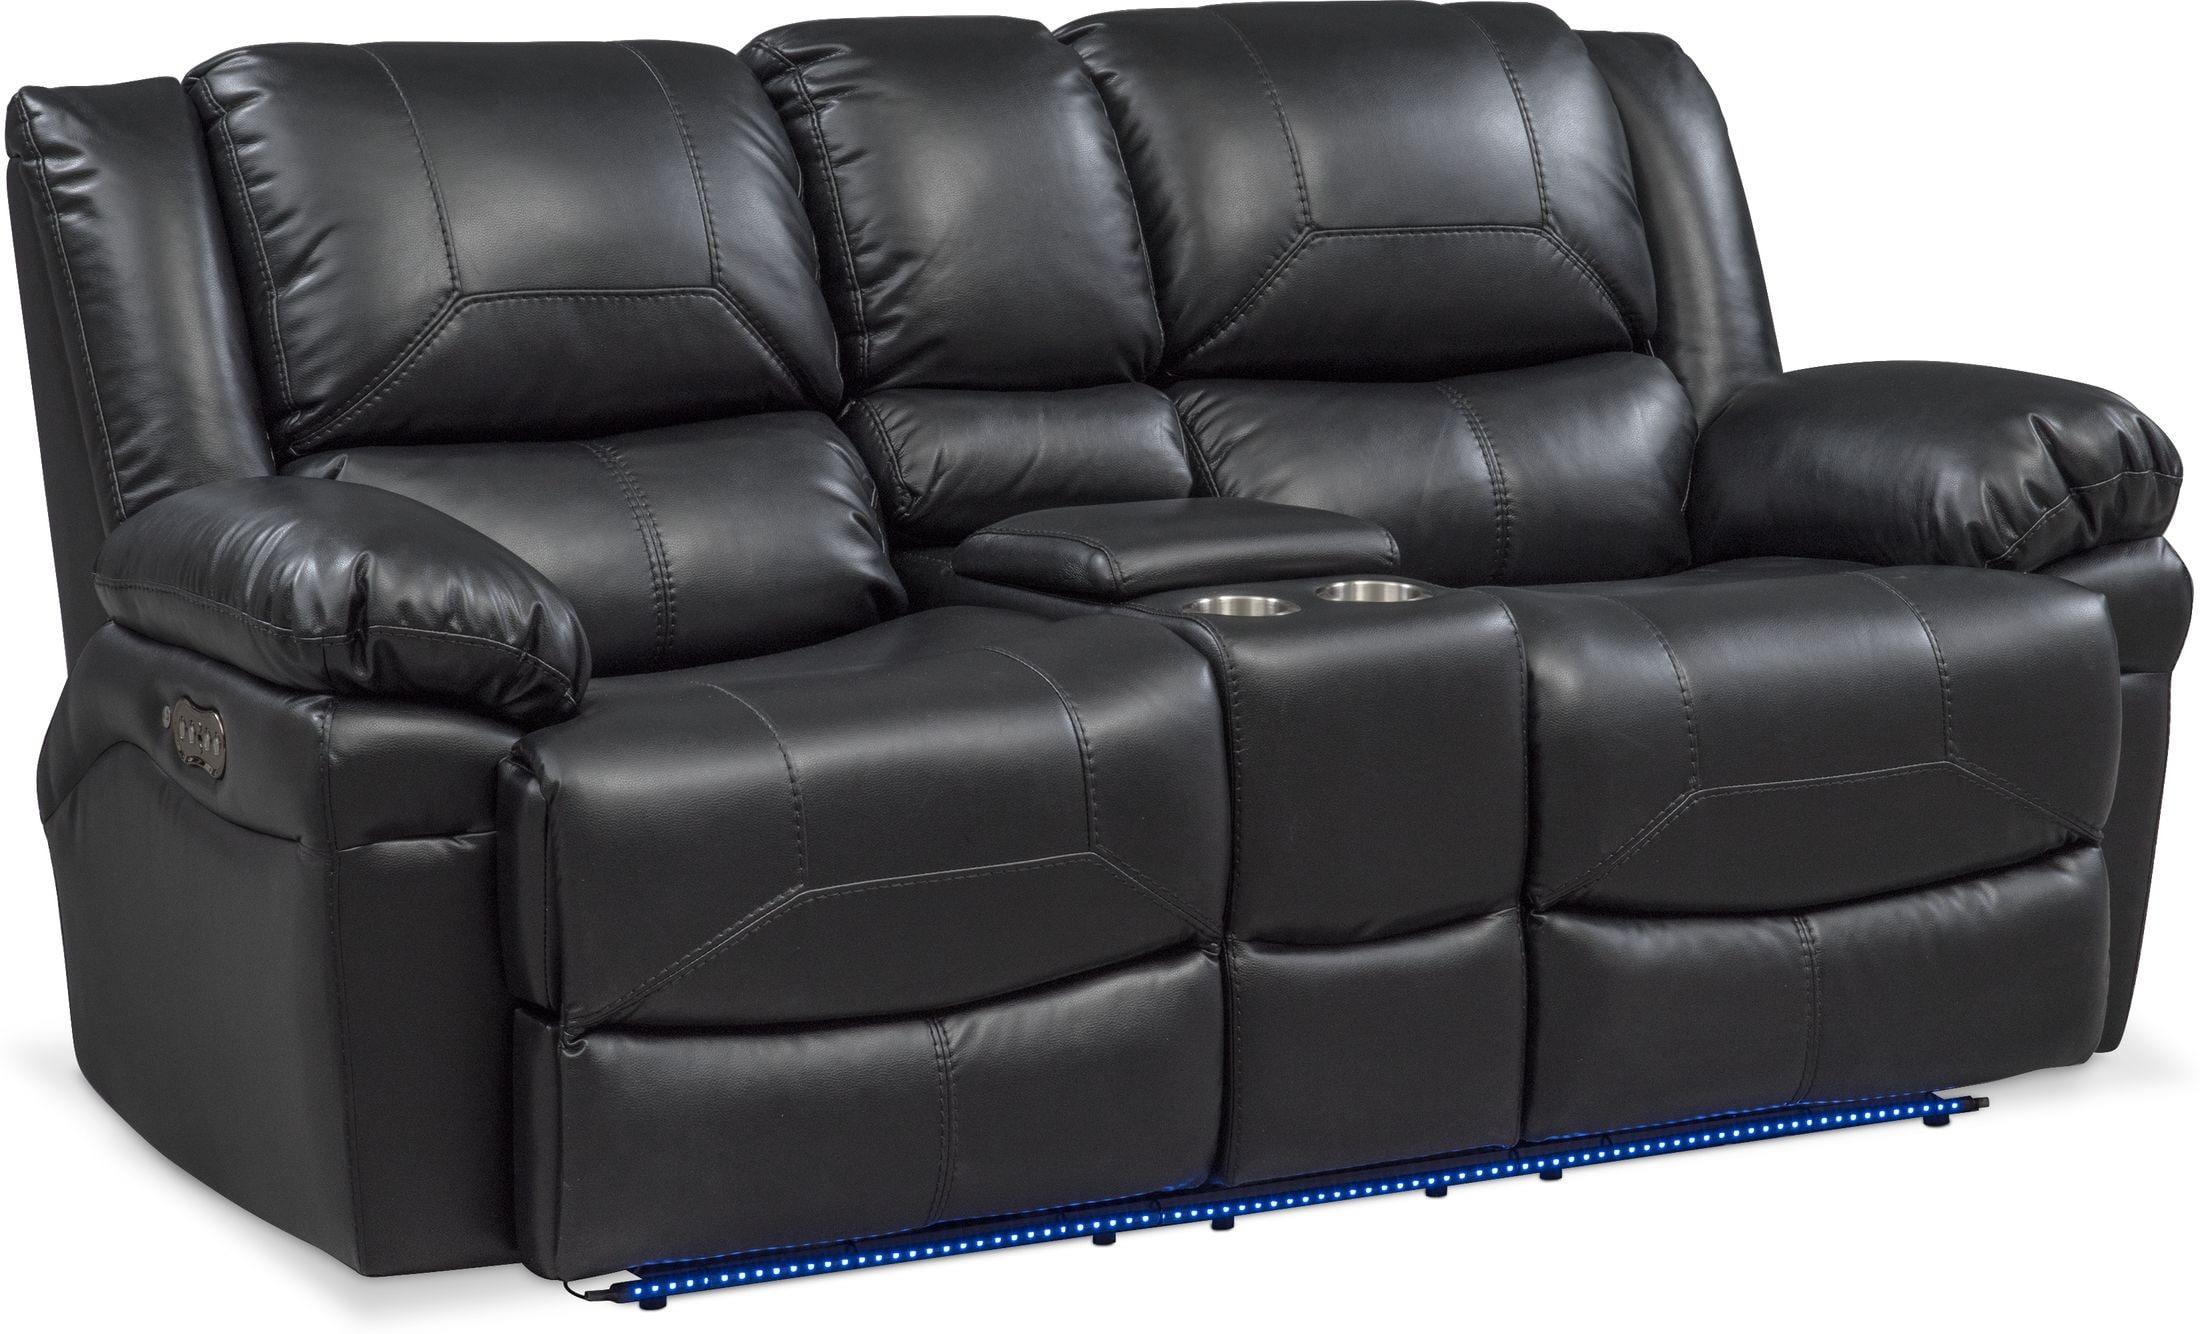 Living Room Furniture - Monza Dual-Power Reclining Loveseat